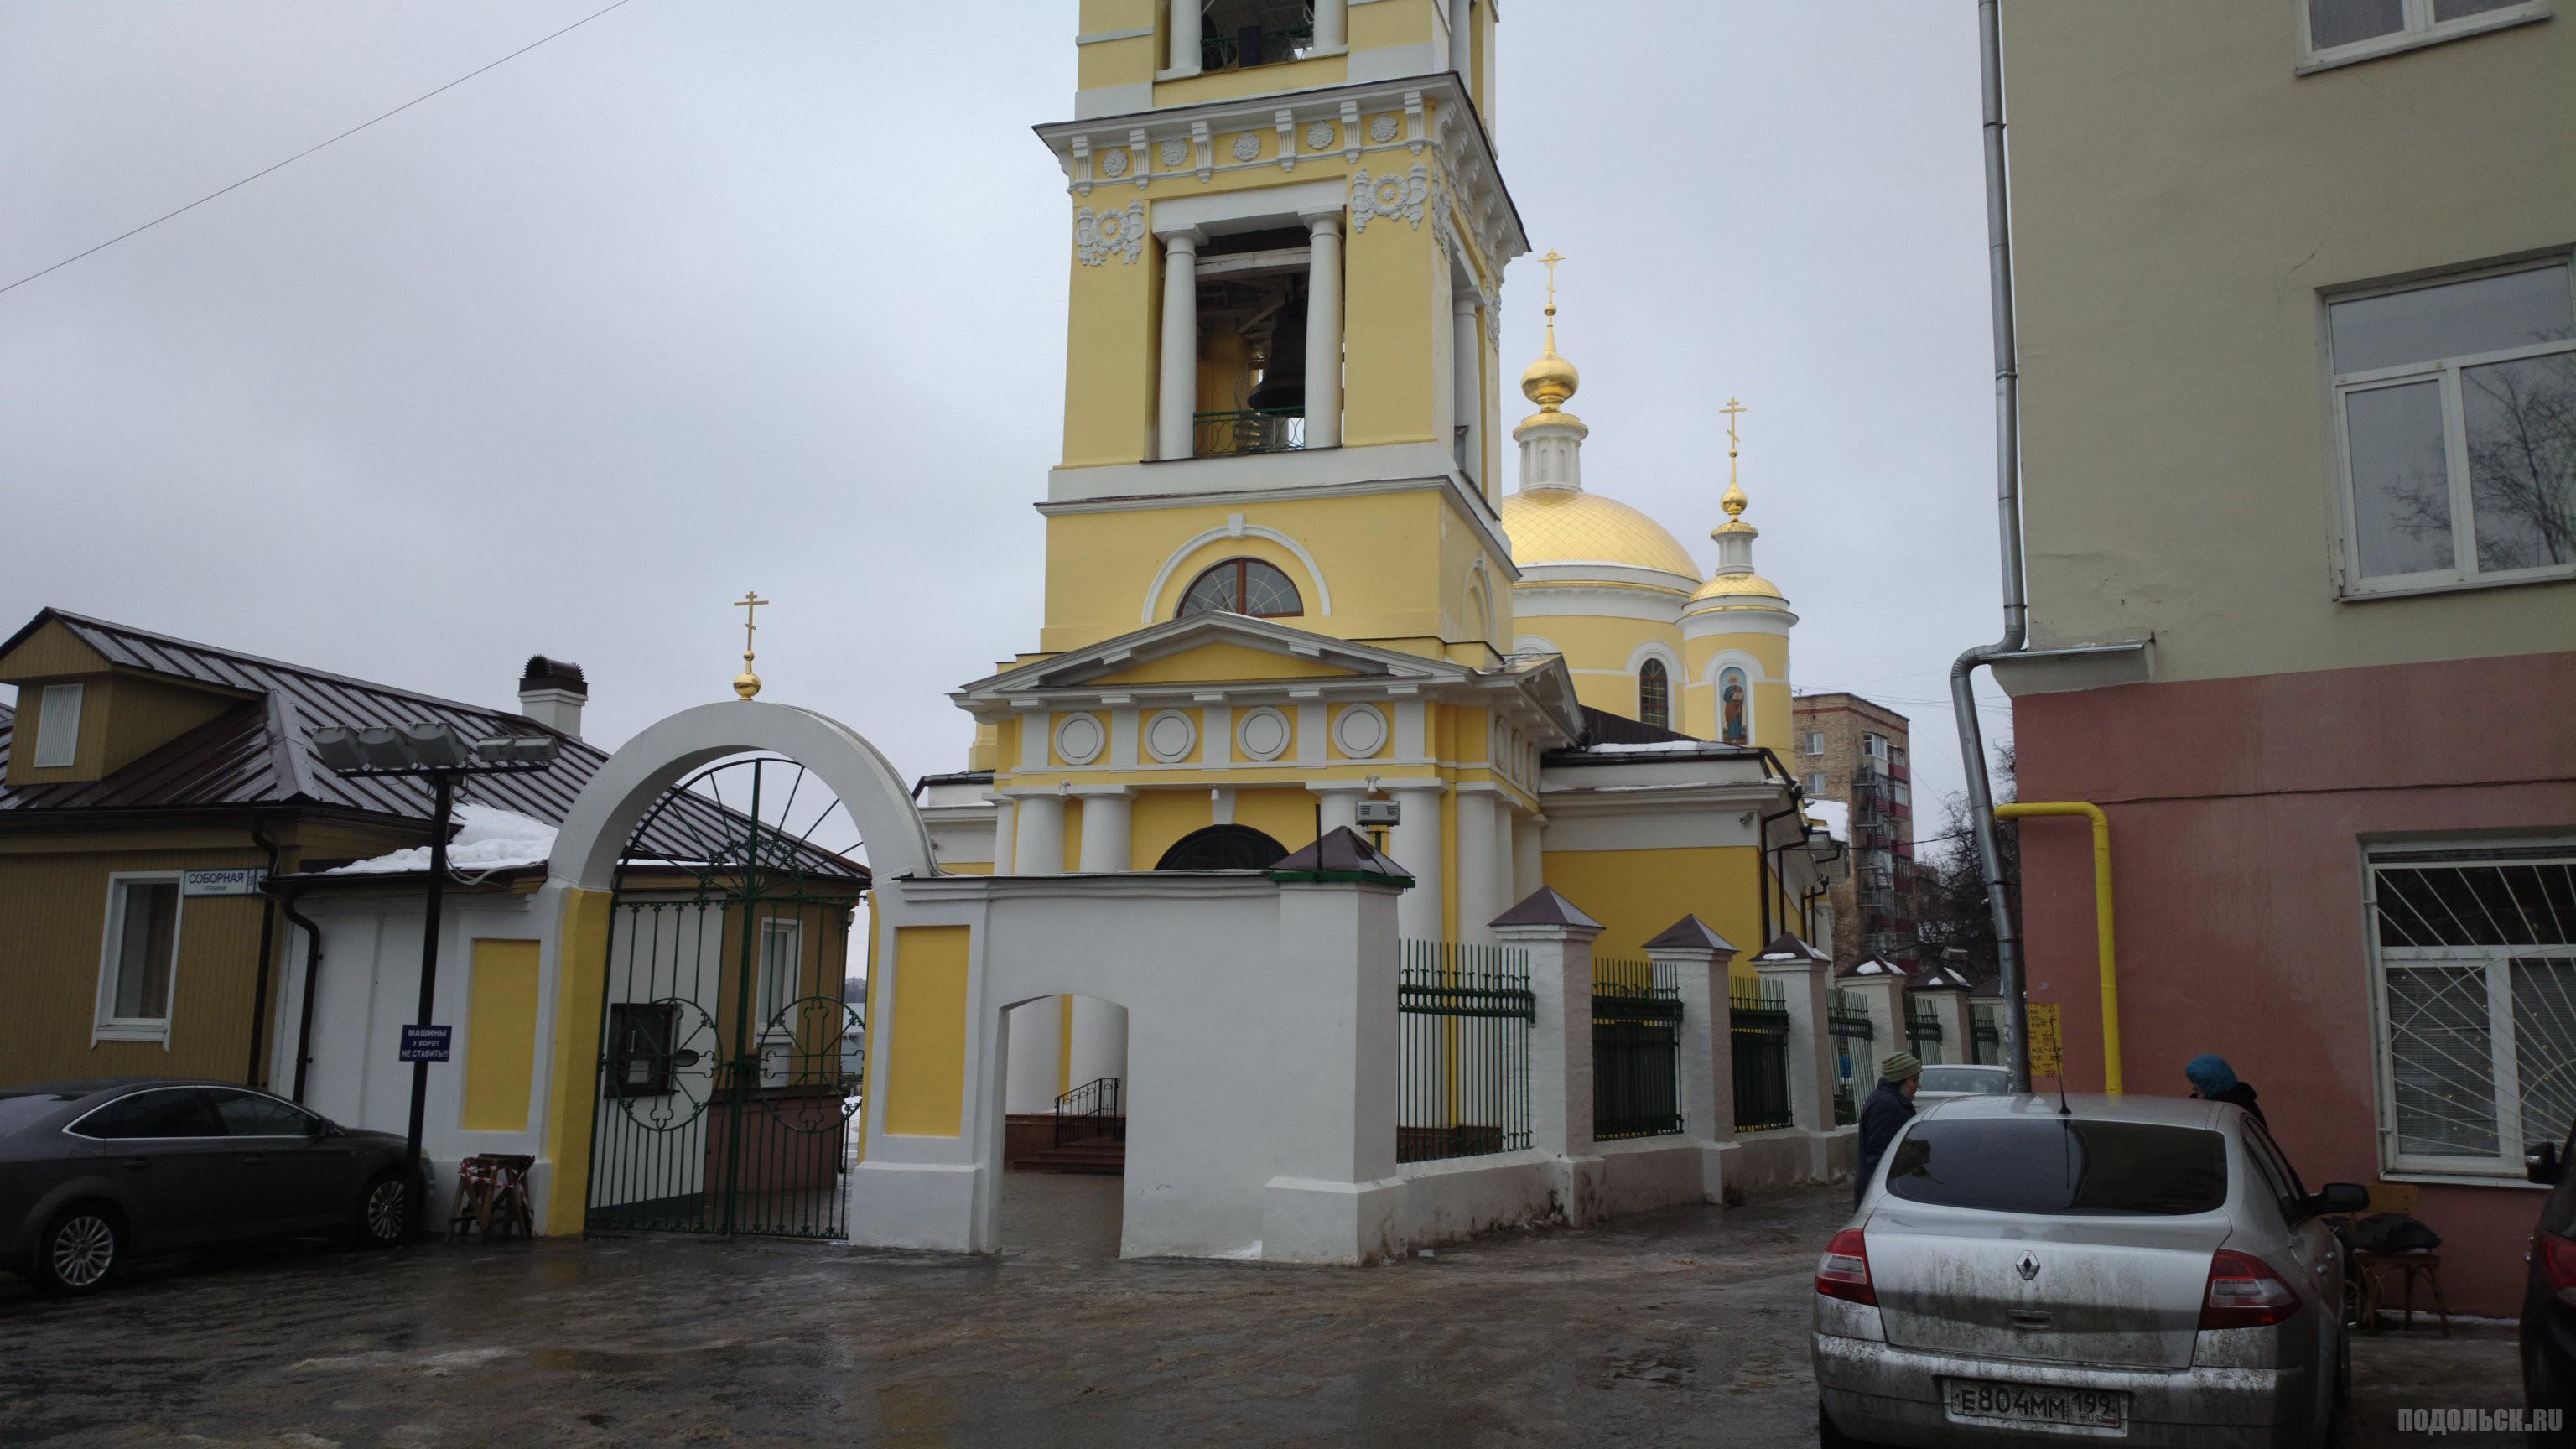 У храма на Соборной площади. Январь 2015 г.